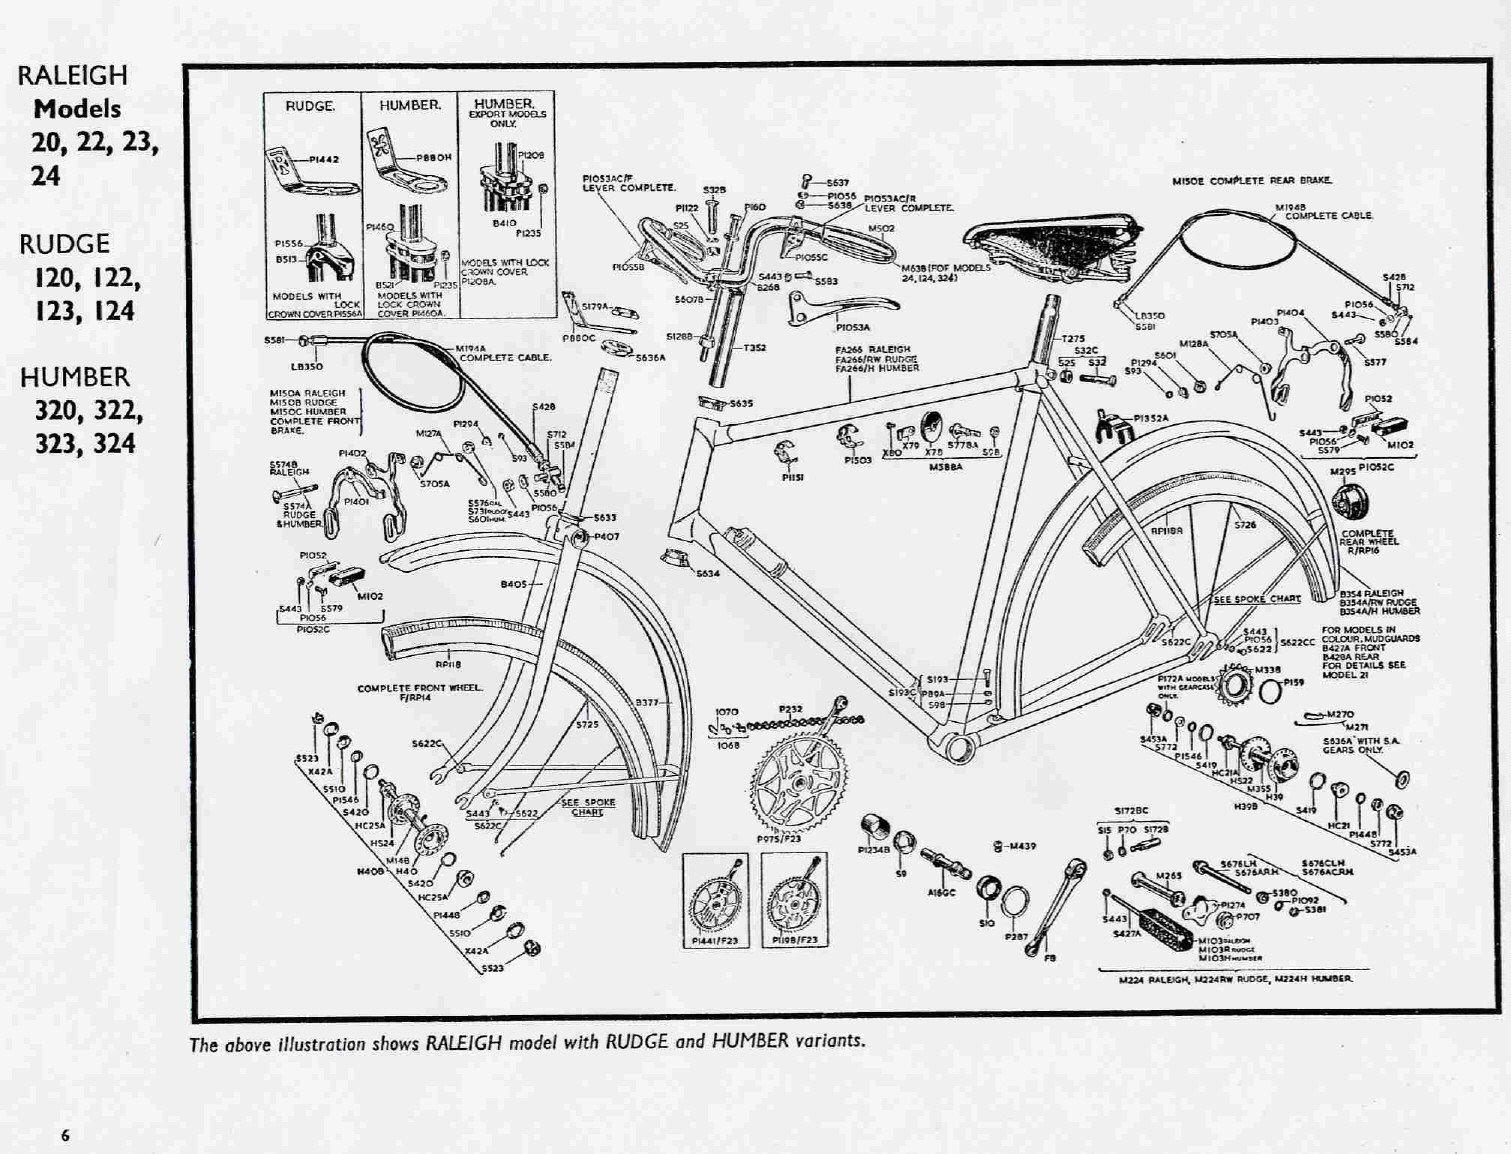 Parts List For 1967 Schwinn Racer 3 Speed In 2020 Bike Print Bicycle Bike Parts